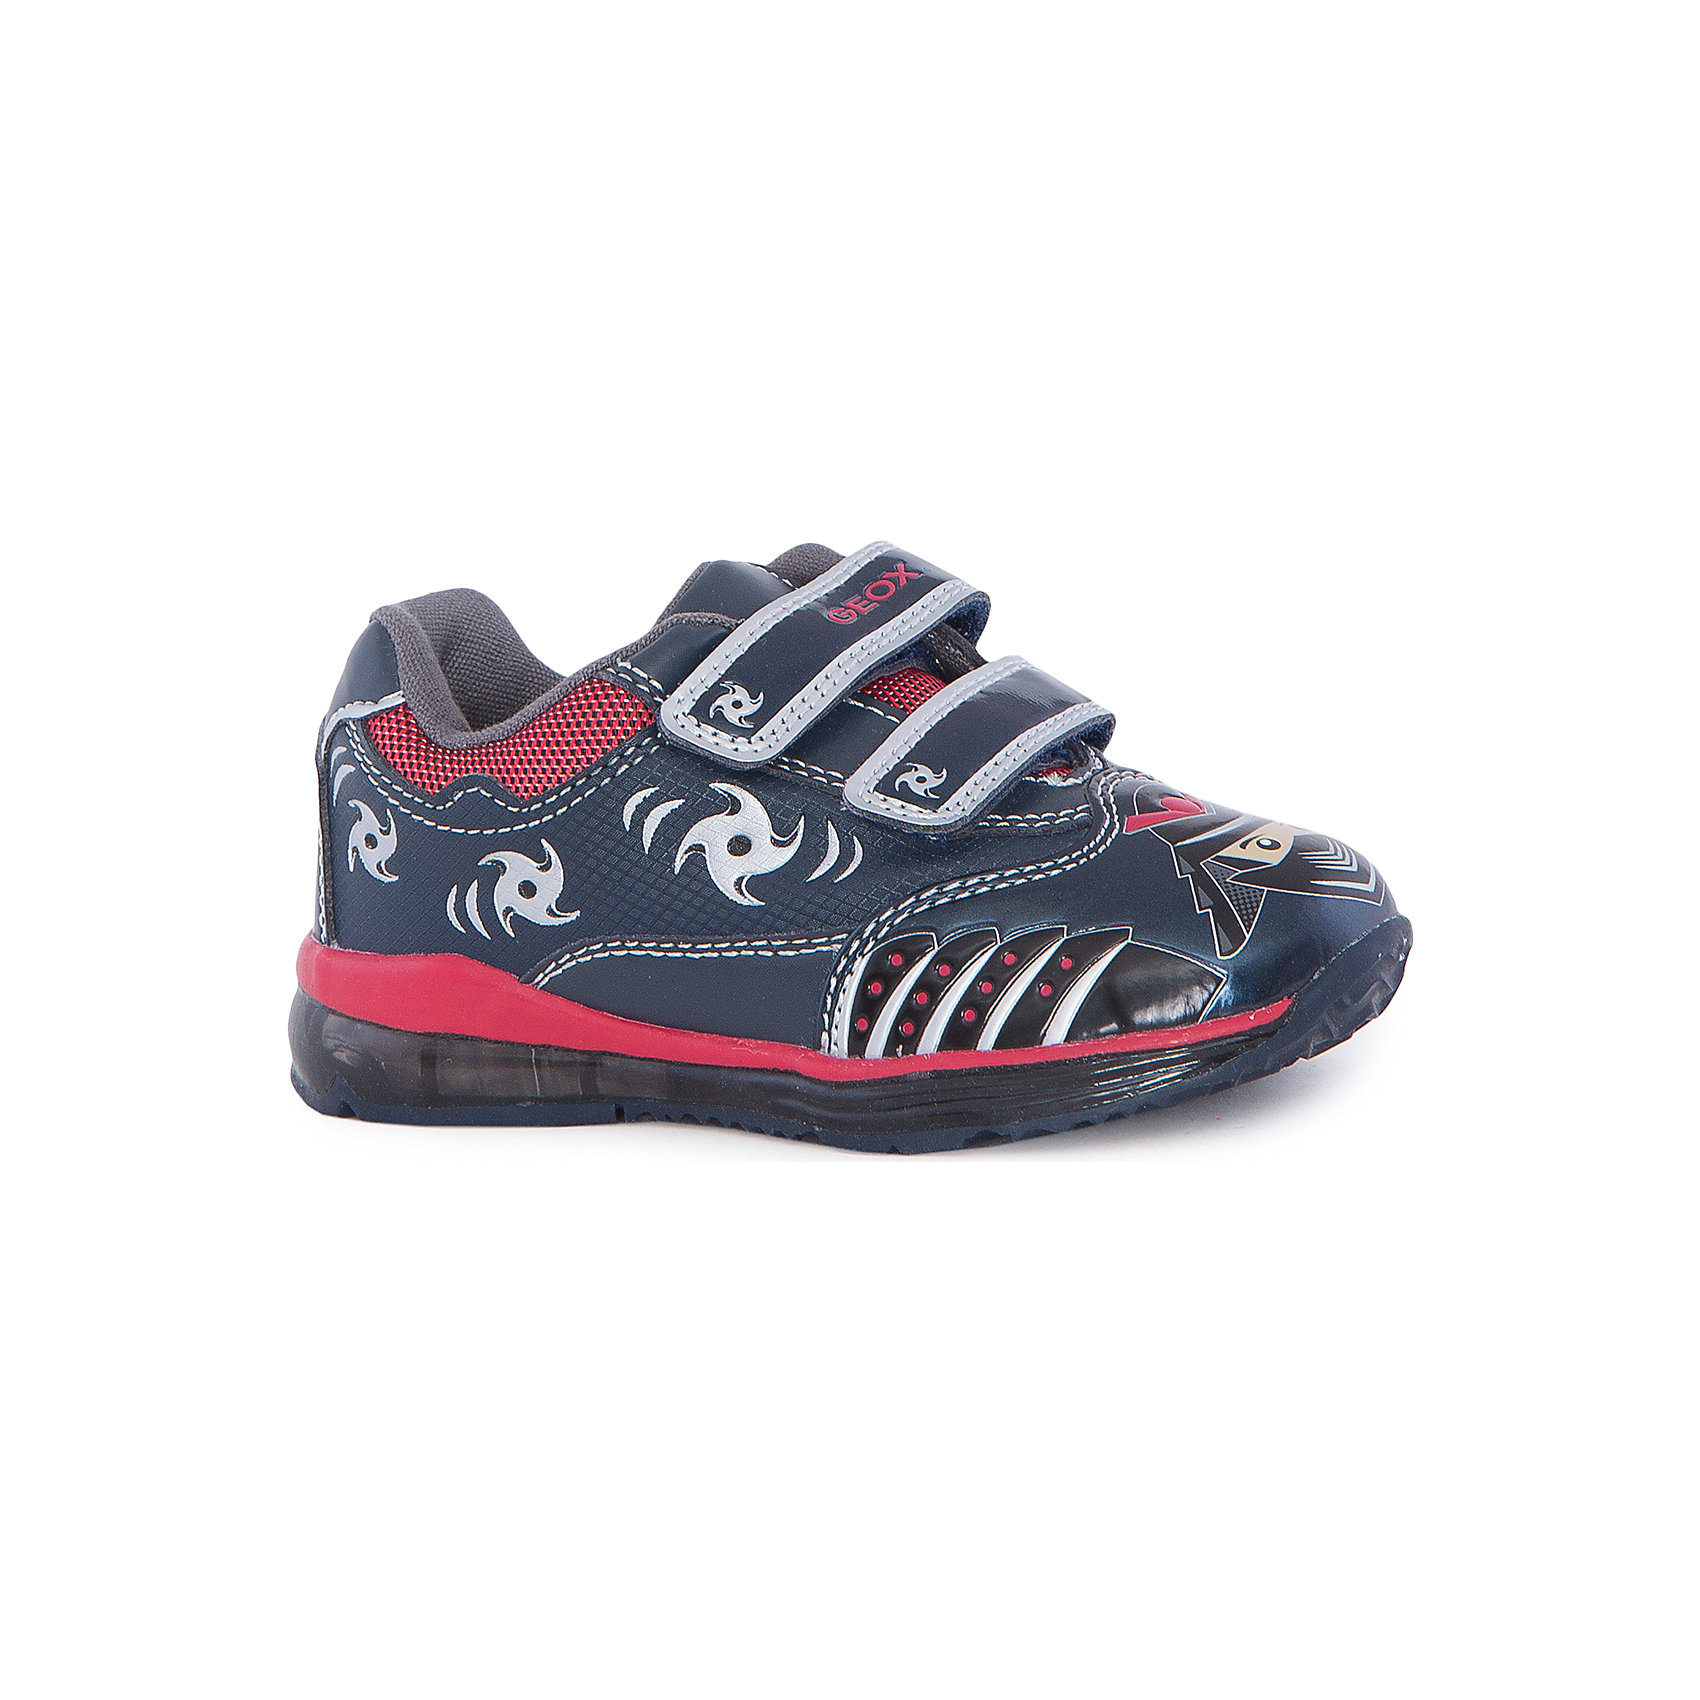 GEOX Кроссовки для мальчика GEOX geox ботинки для мальчика geox